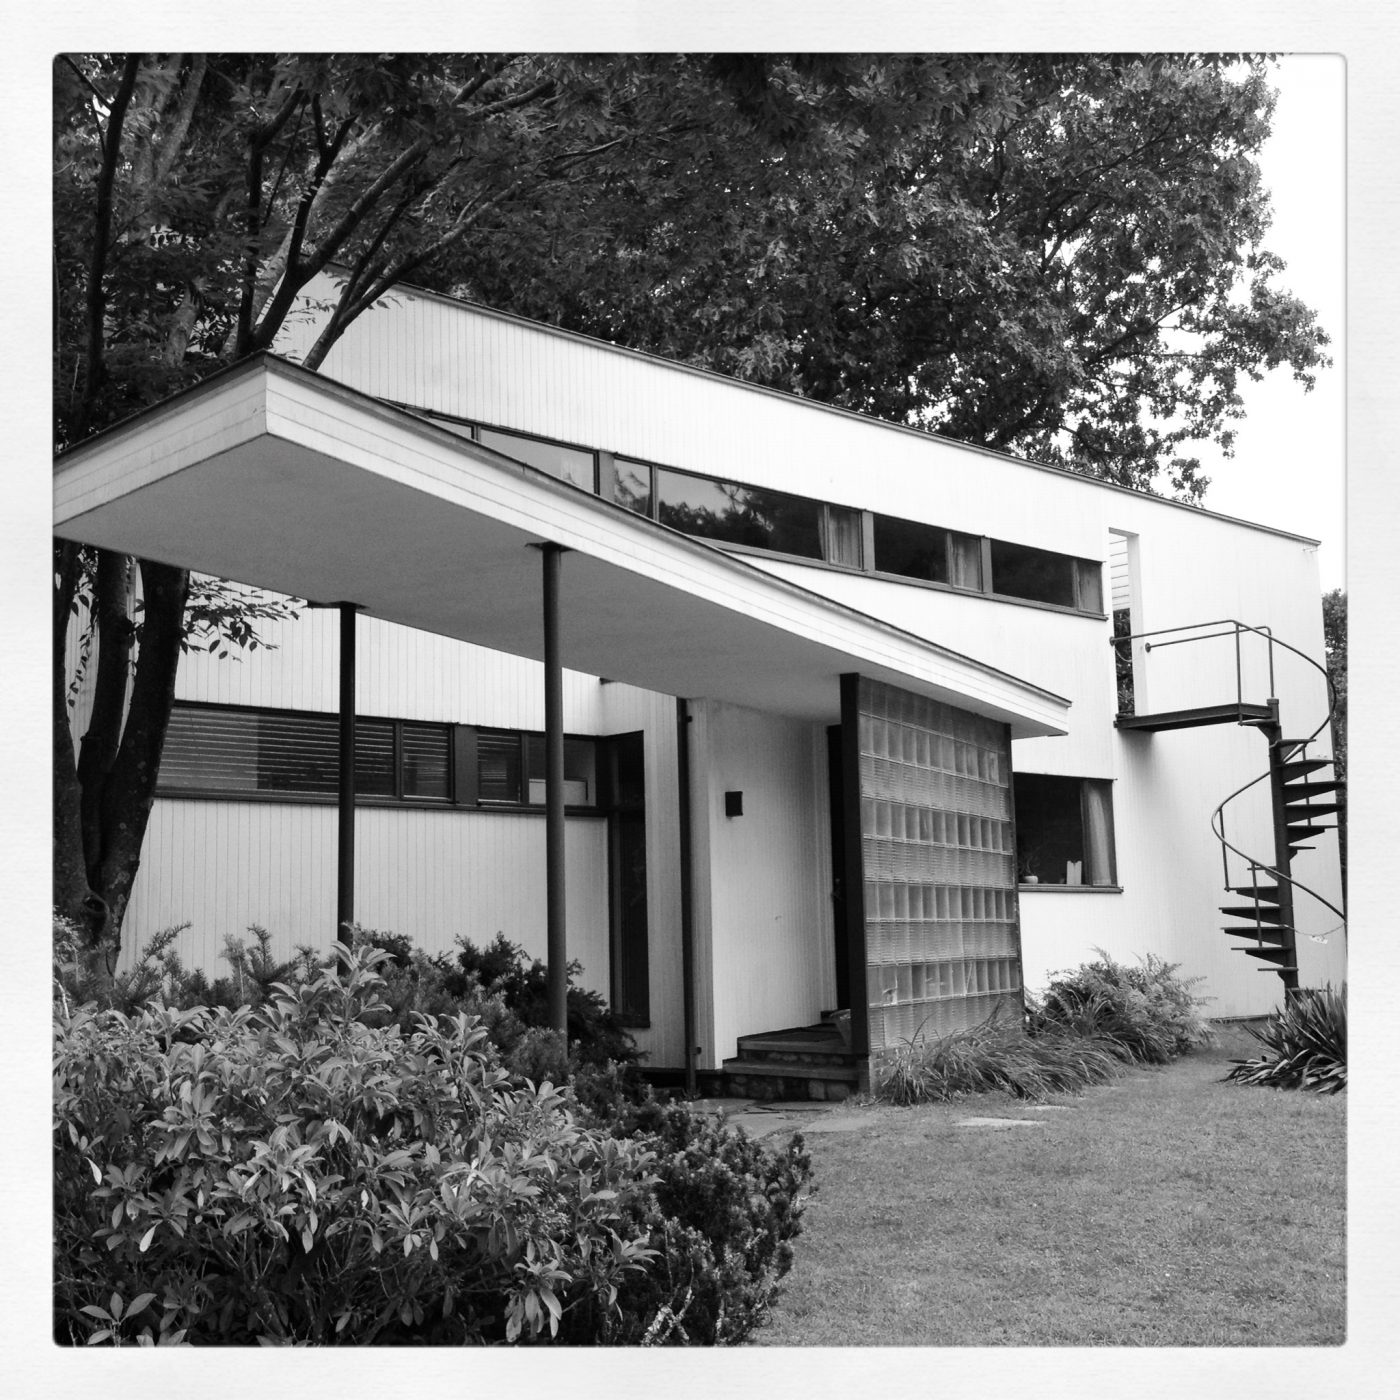 The Gropius House